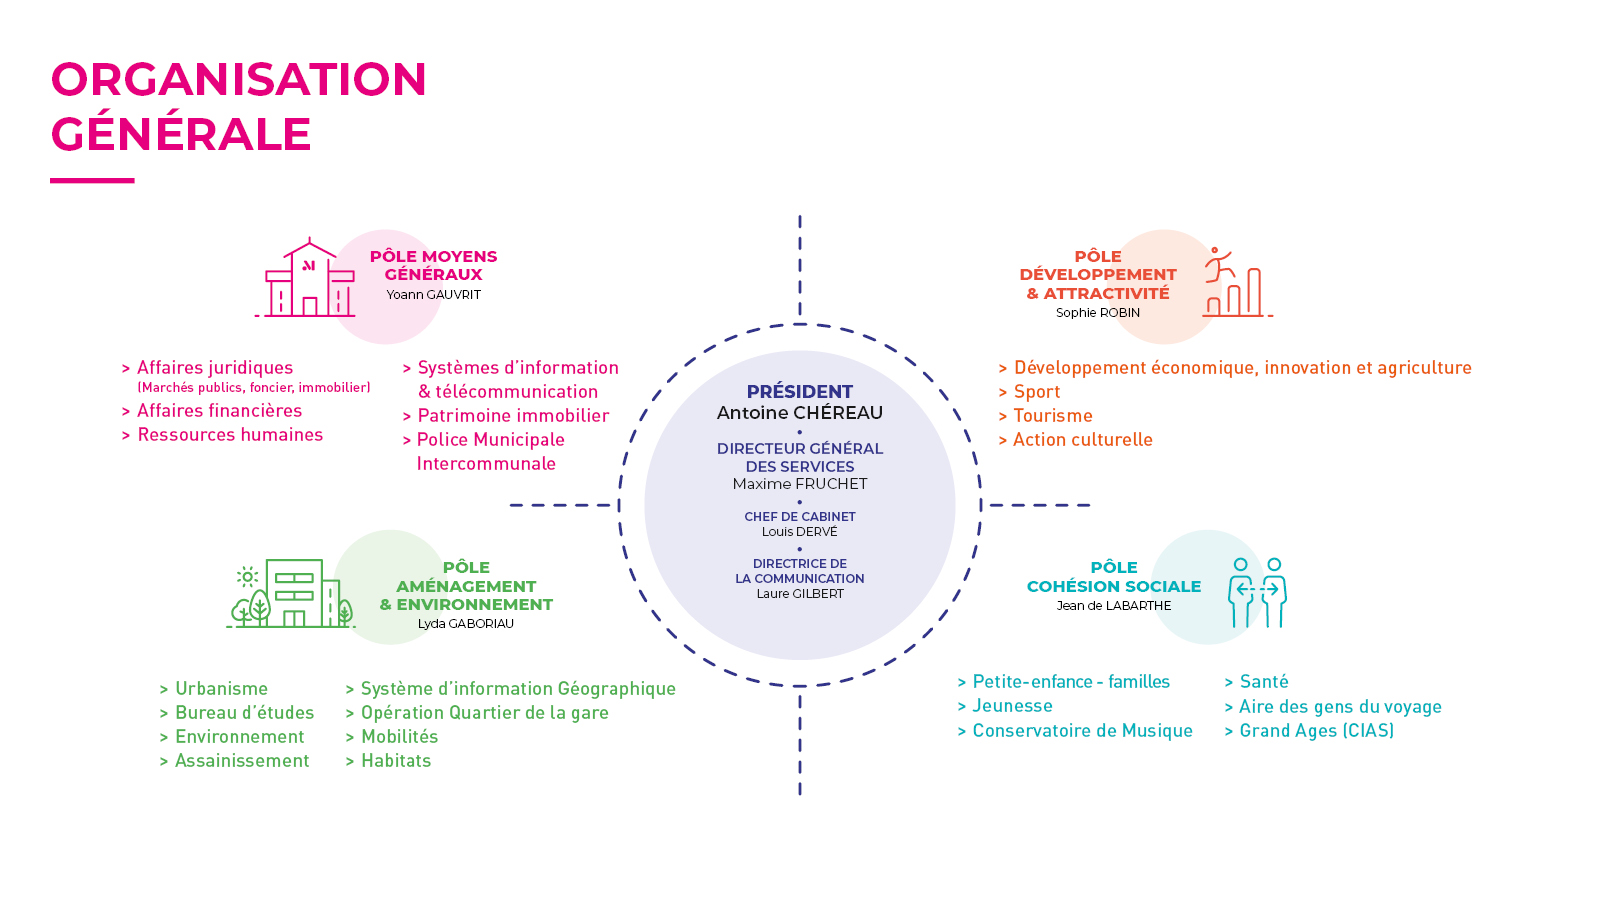 Image : schéma organigramme 2021 Terres de Montaigu